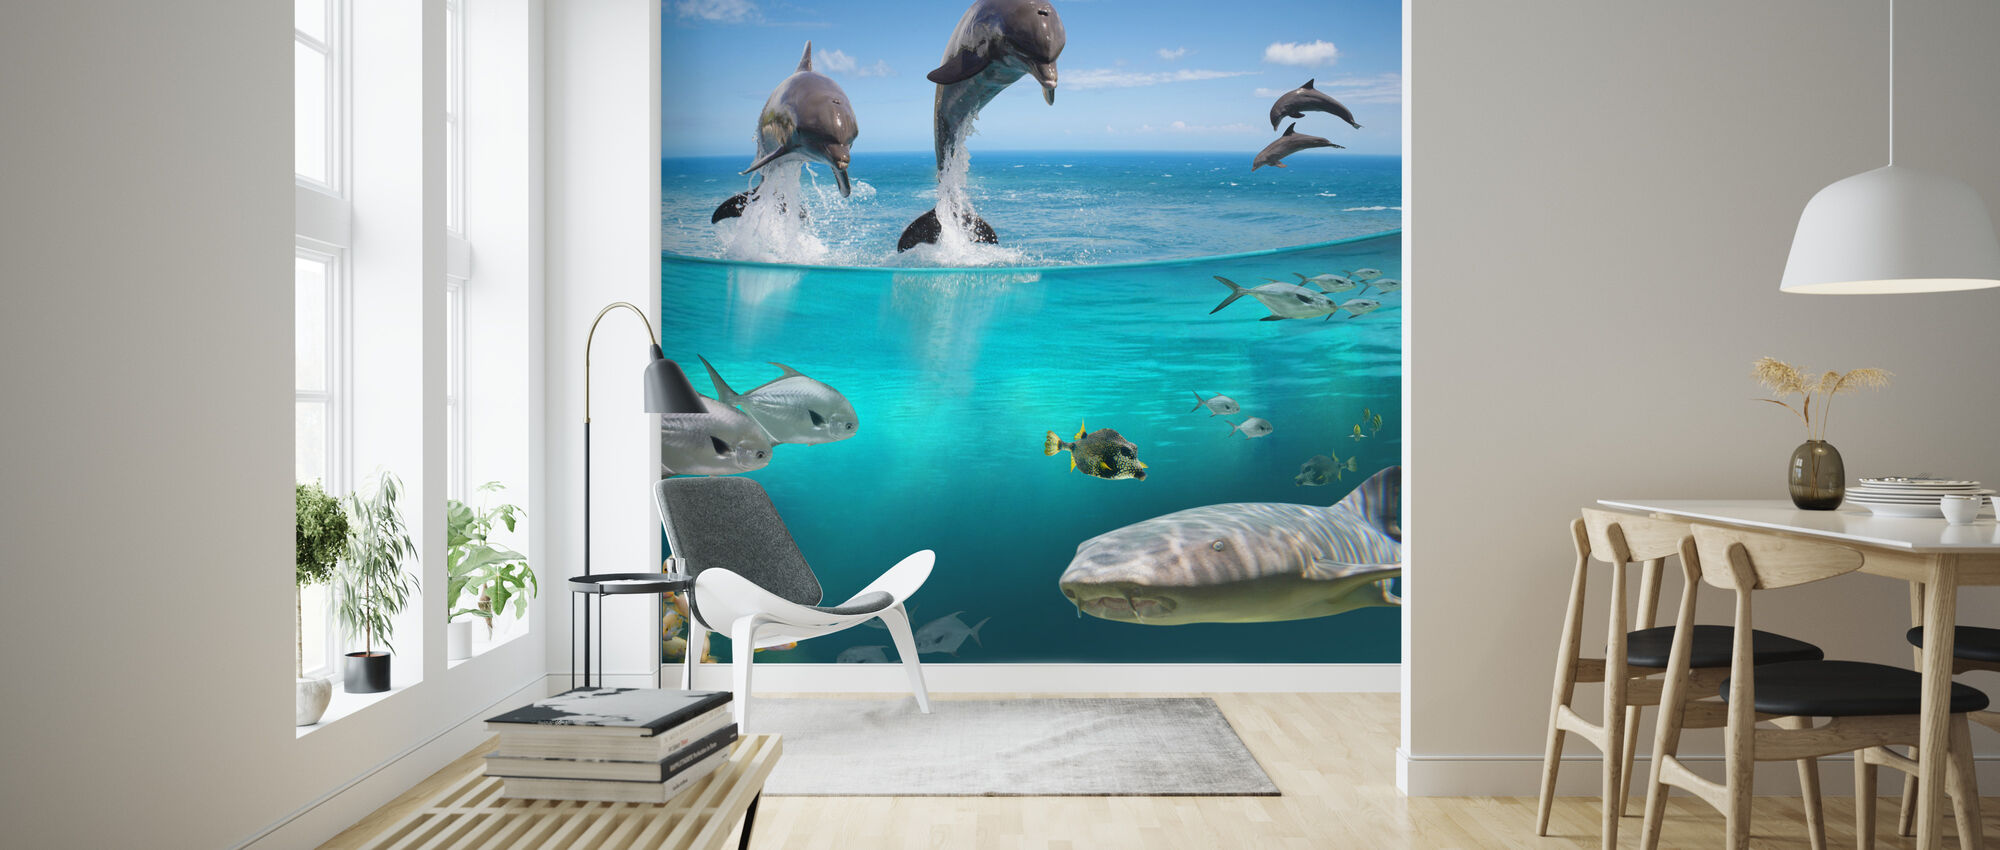 Sea Life Affordable Wall Mural Photowall